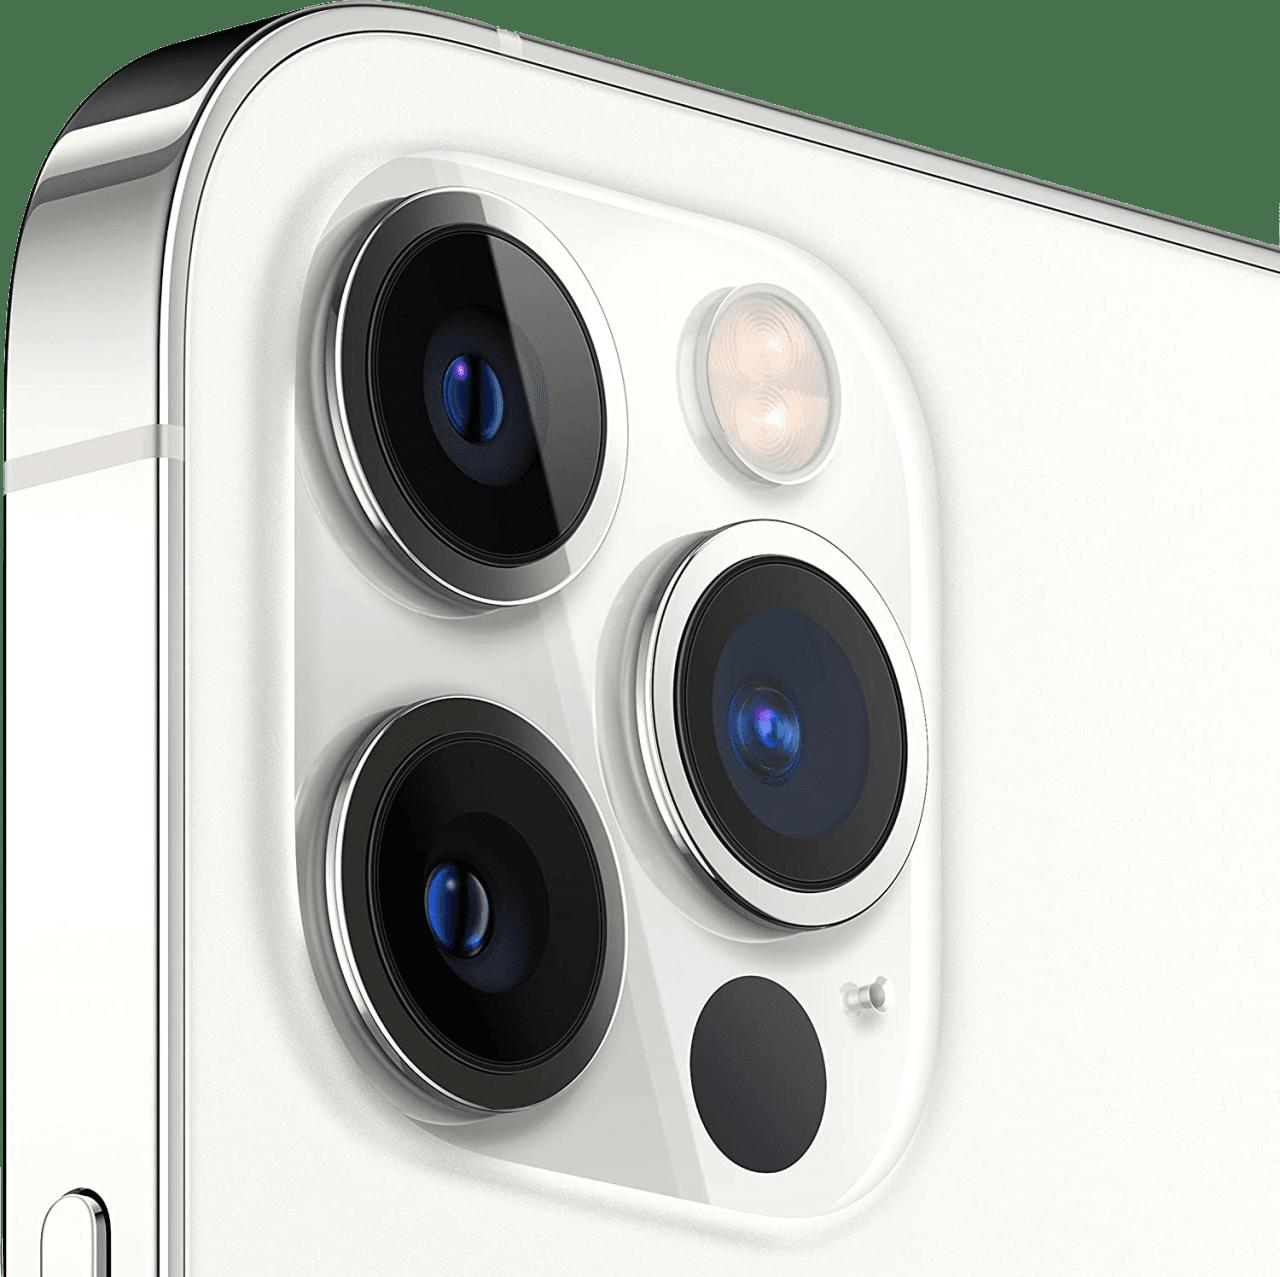 Silber Apple iPhone 12 Pro Max 256GB.4